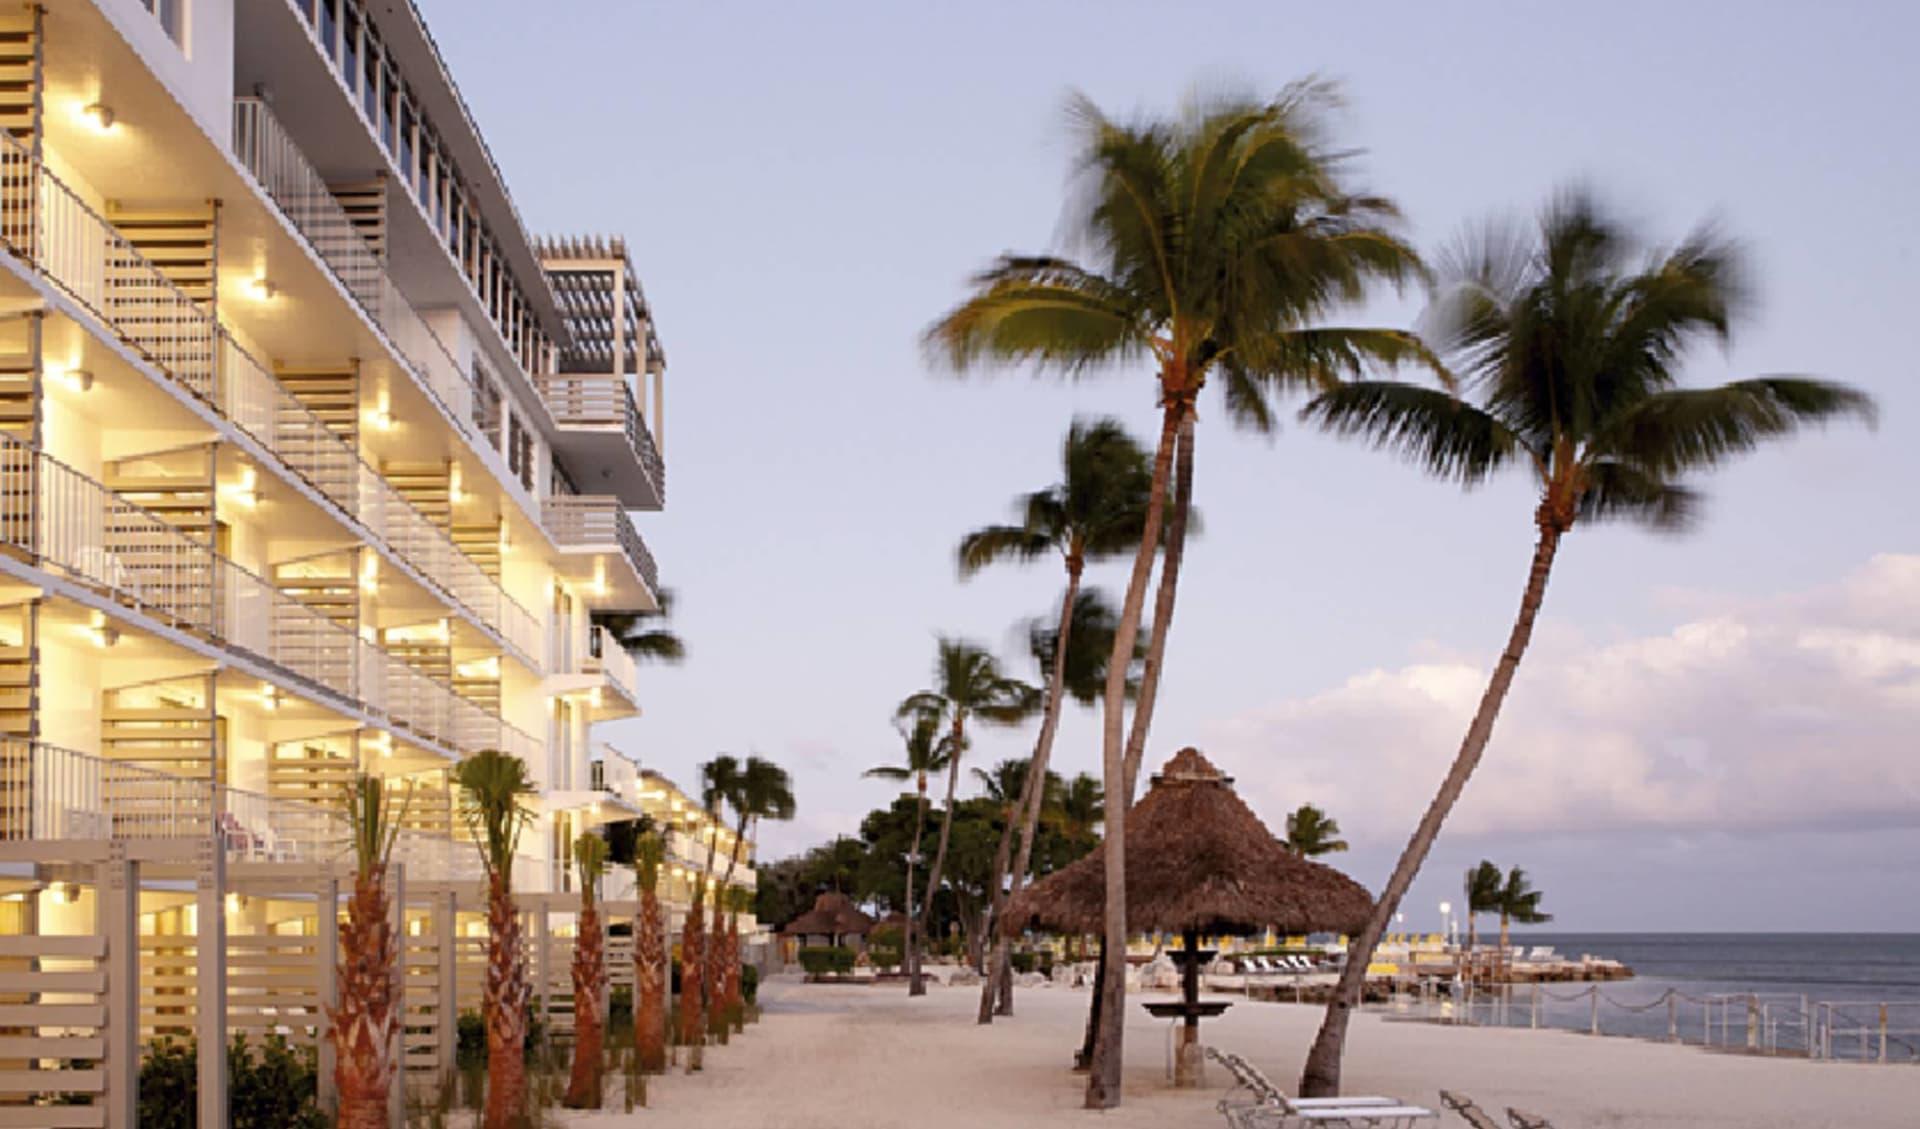 Postcard Inn Beach Resort Islamorada: exterior postcard inn islamorada hotelansicht strand palmen